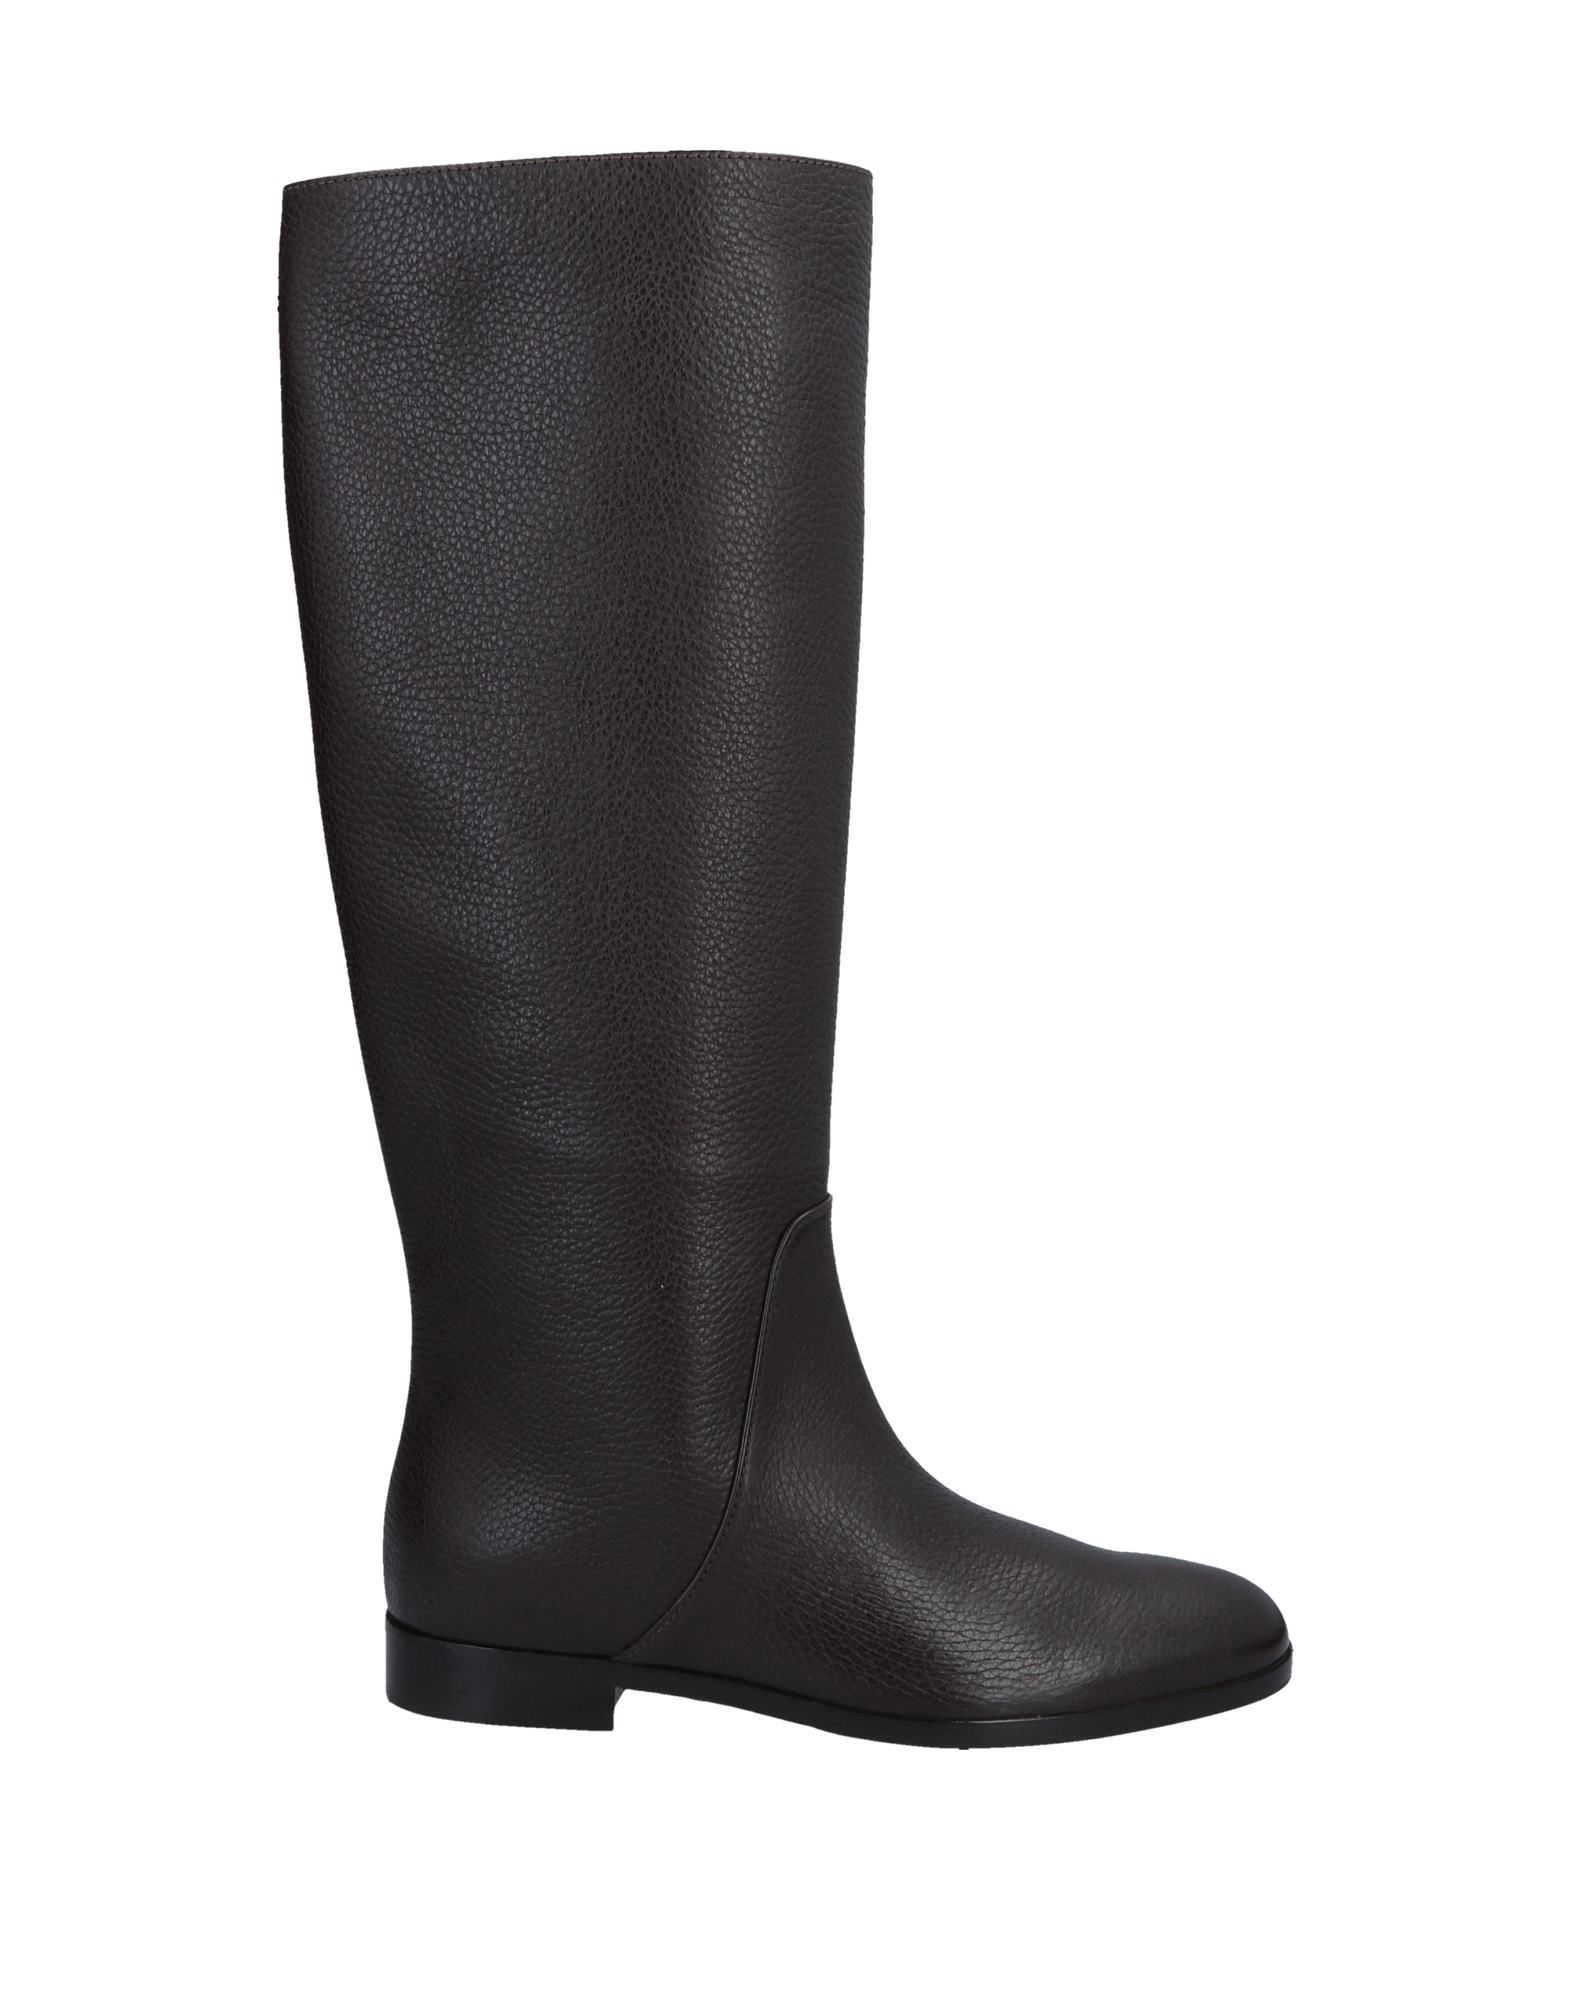 Sergio Rossi Boots - Women Sergio Rossi United Boots online on  United Rossi Kingdom - 11067968LF f27c1f